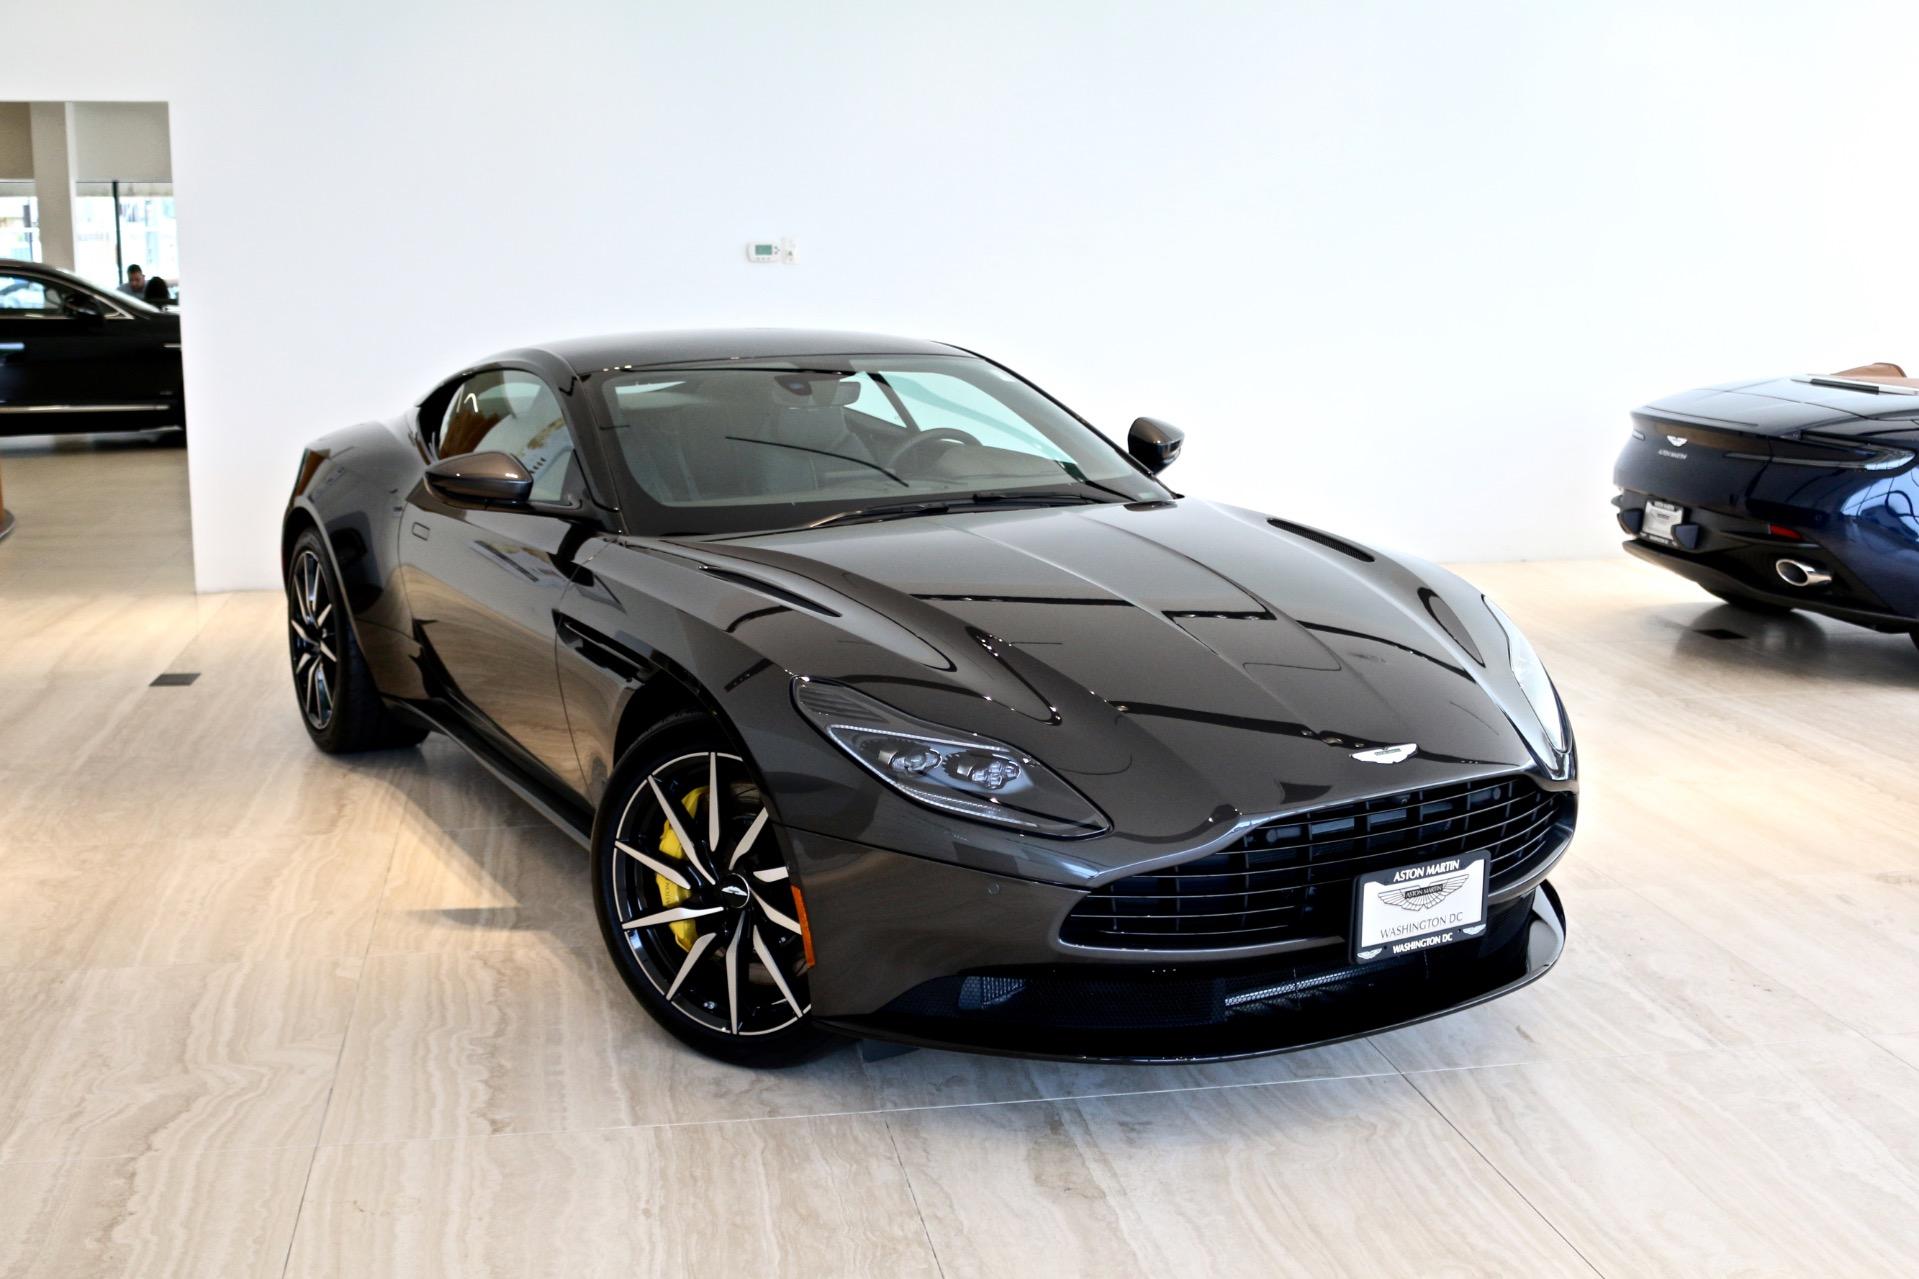 Aston Martin Stock >> 2018 Aston Martin Db11 V8 Stock 8l04039 For Sale Near